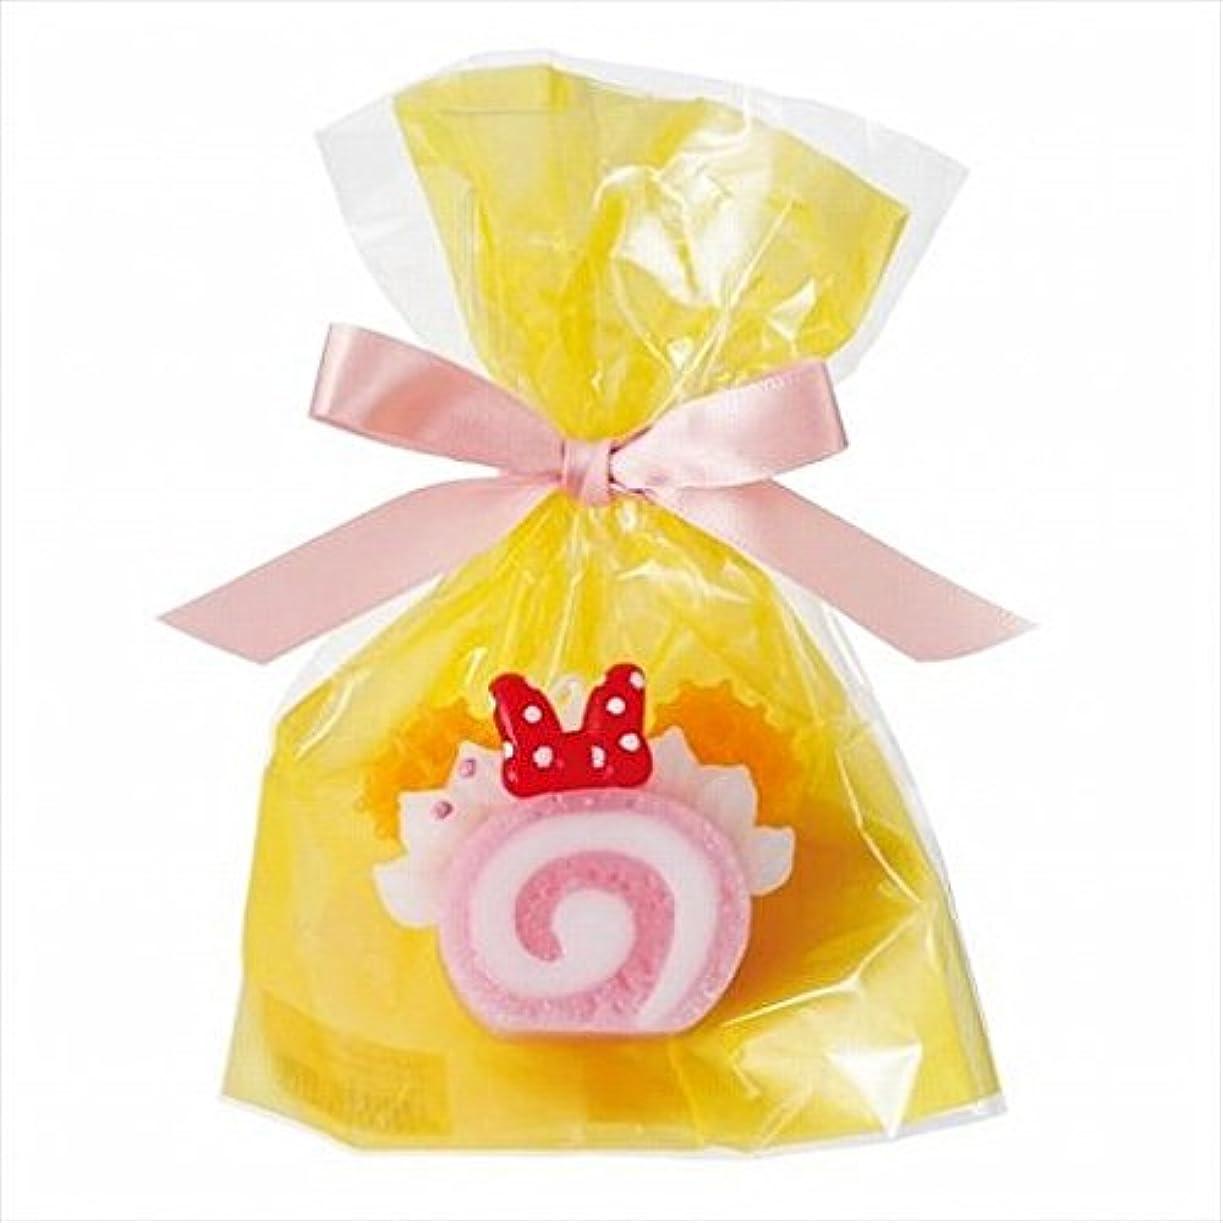 sweets candle(スイーツキャンドル) ディズニースイーツキャンドル 「 ピンクロールケーキ 」 キャンドル 55x30x44mm (A4350030)